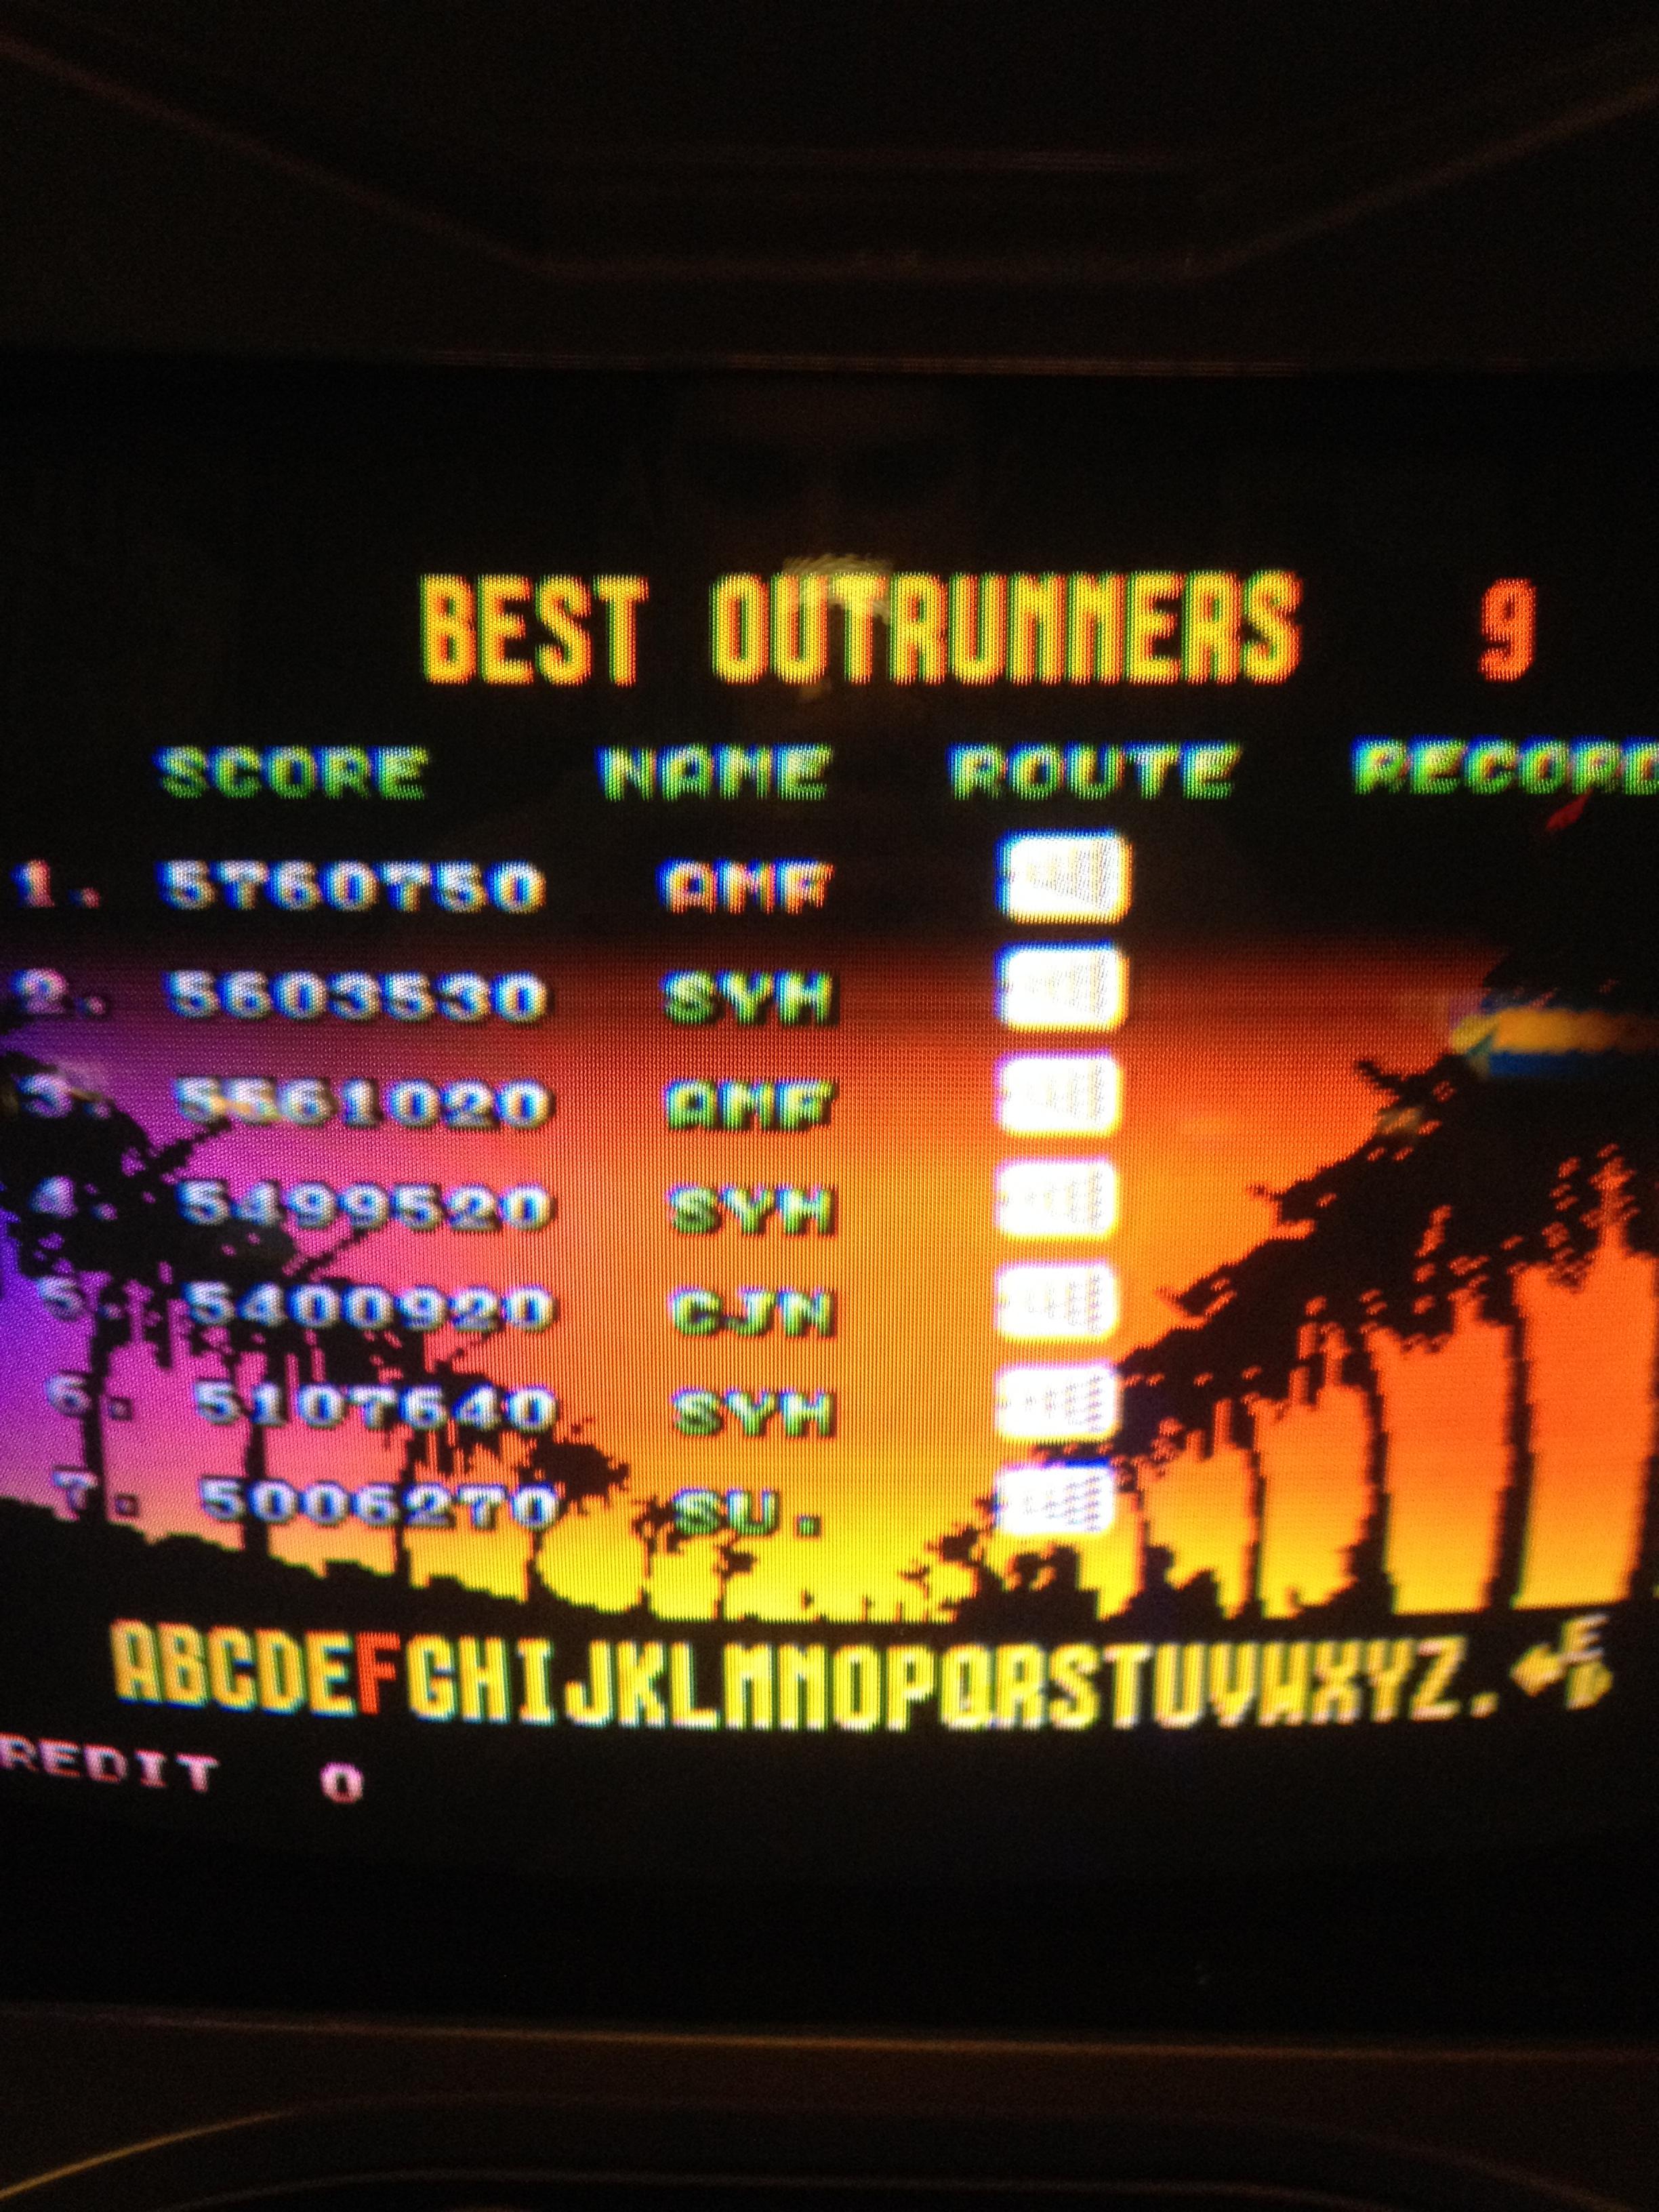 FosterAMF: Outrun (Arcade) 5,760,750 points on 2014-04-13 23:58:50